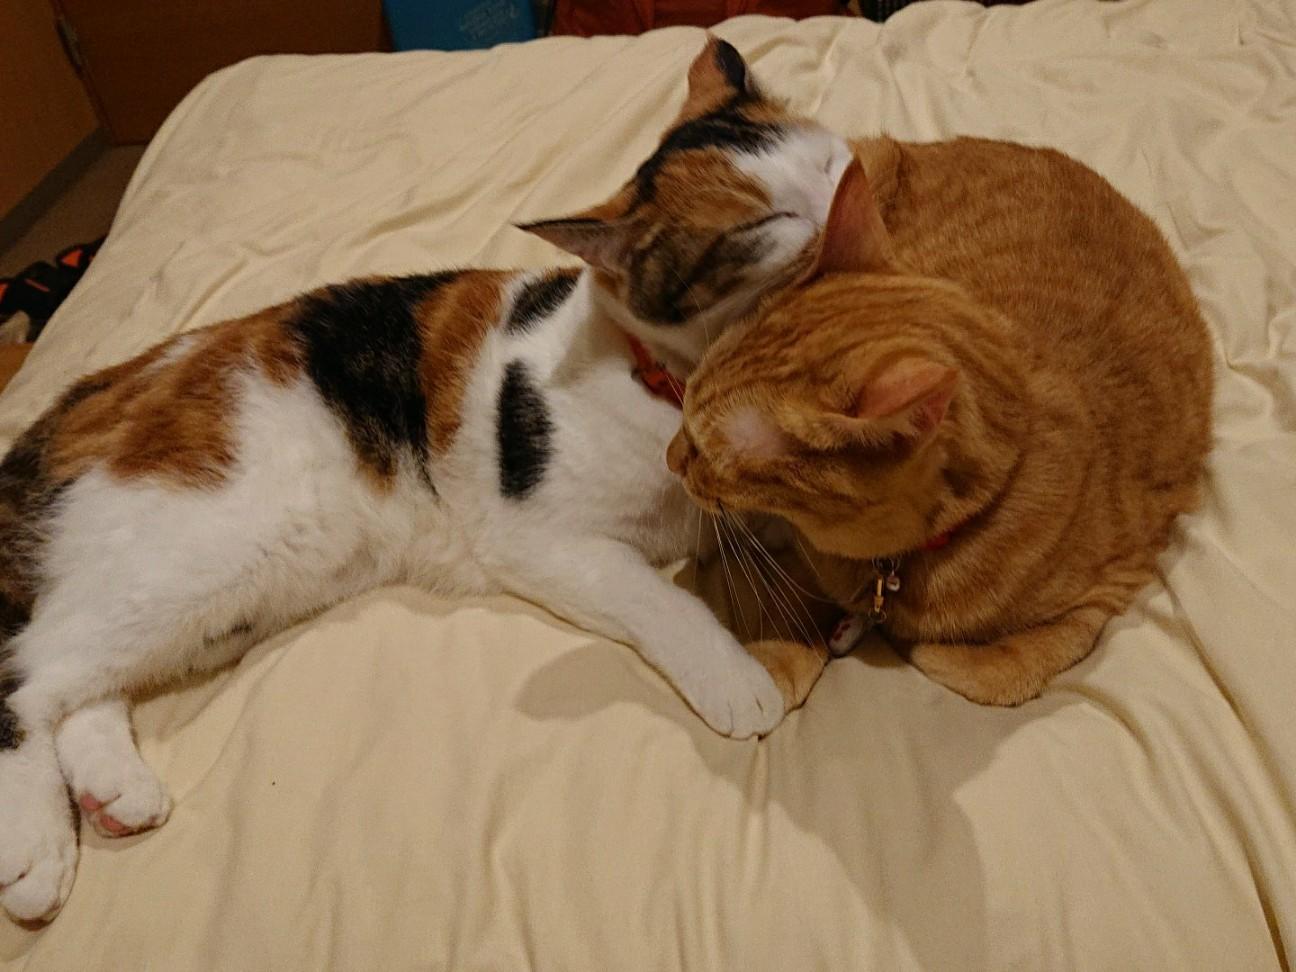 f:id:Three_Traveling_Cats:20190909224500j:image